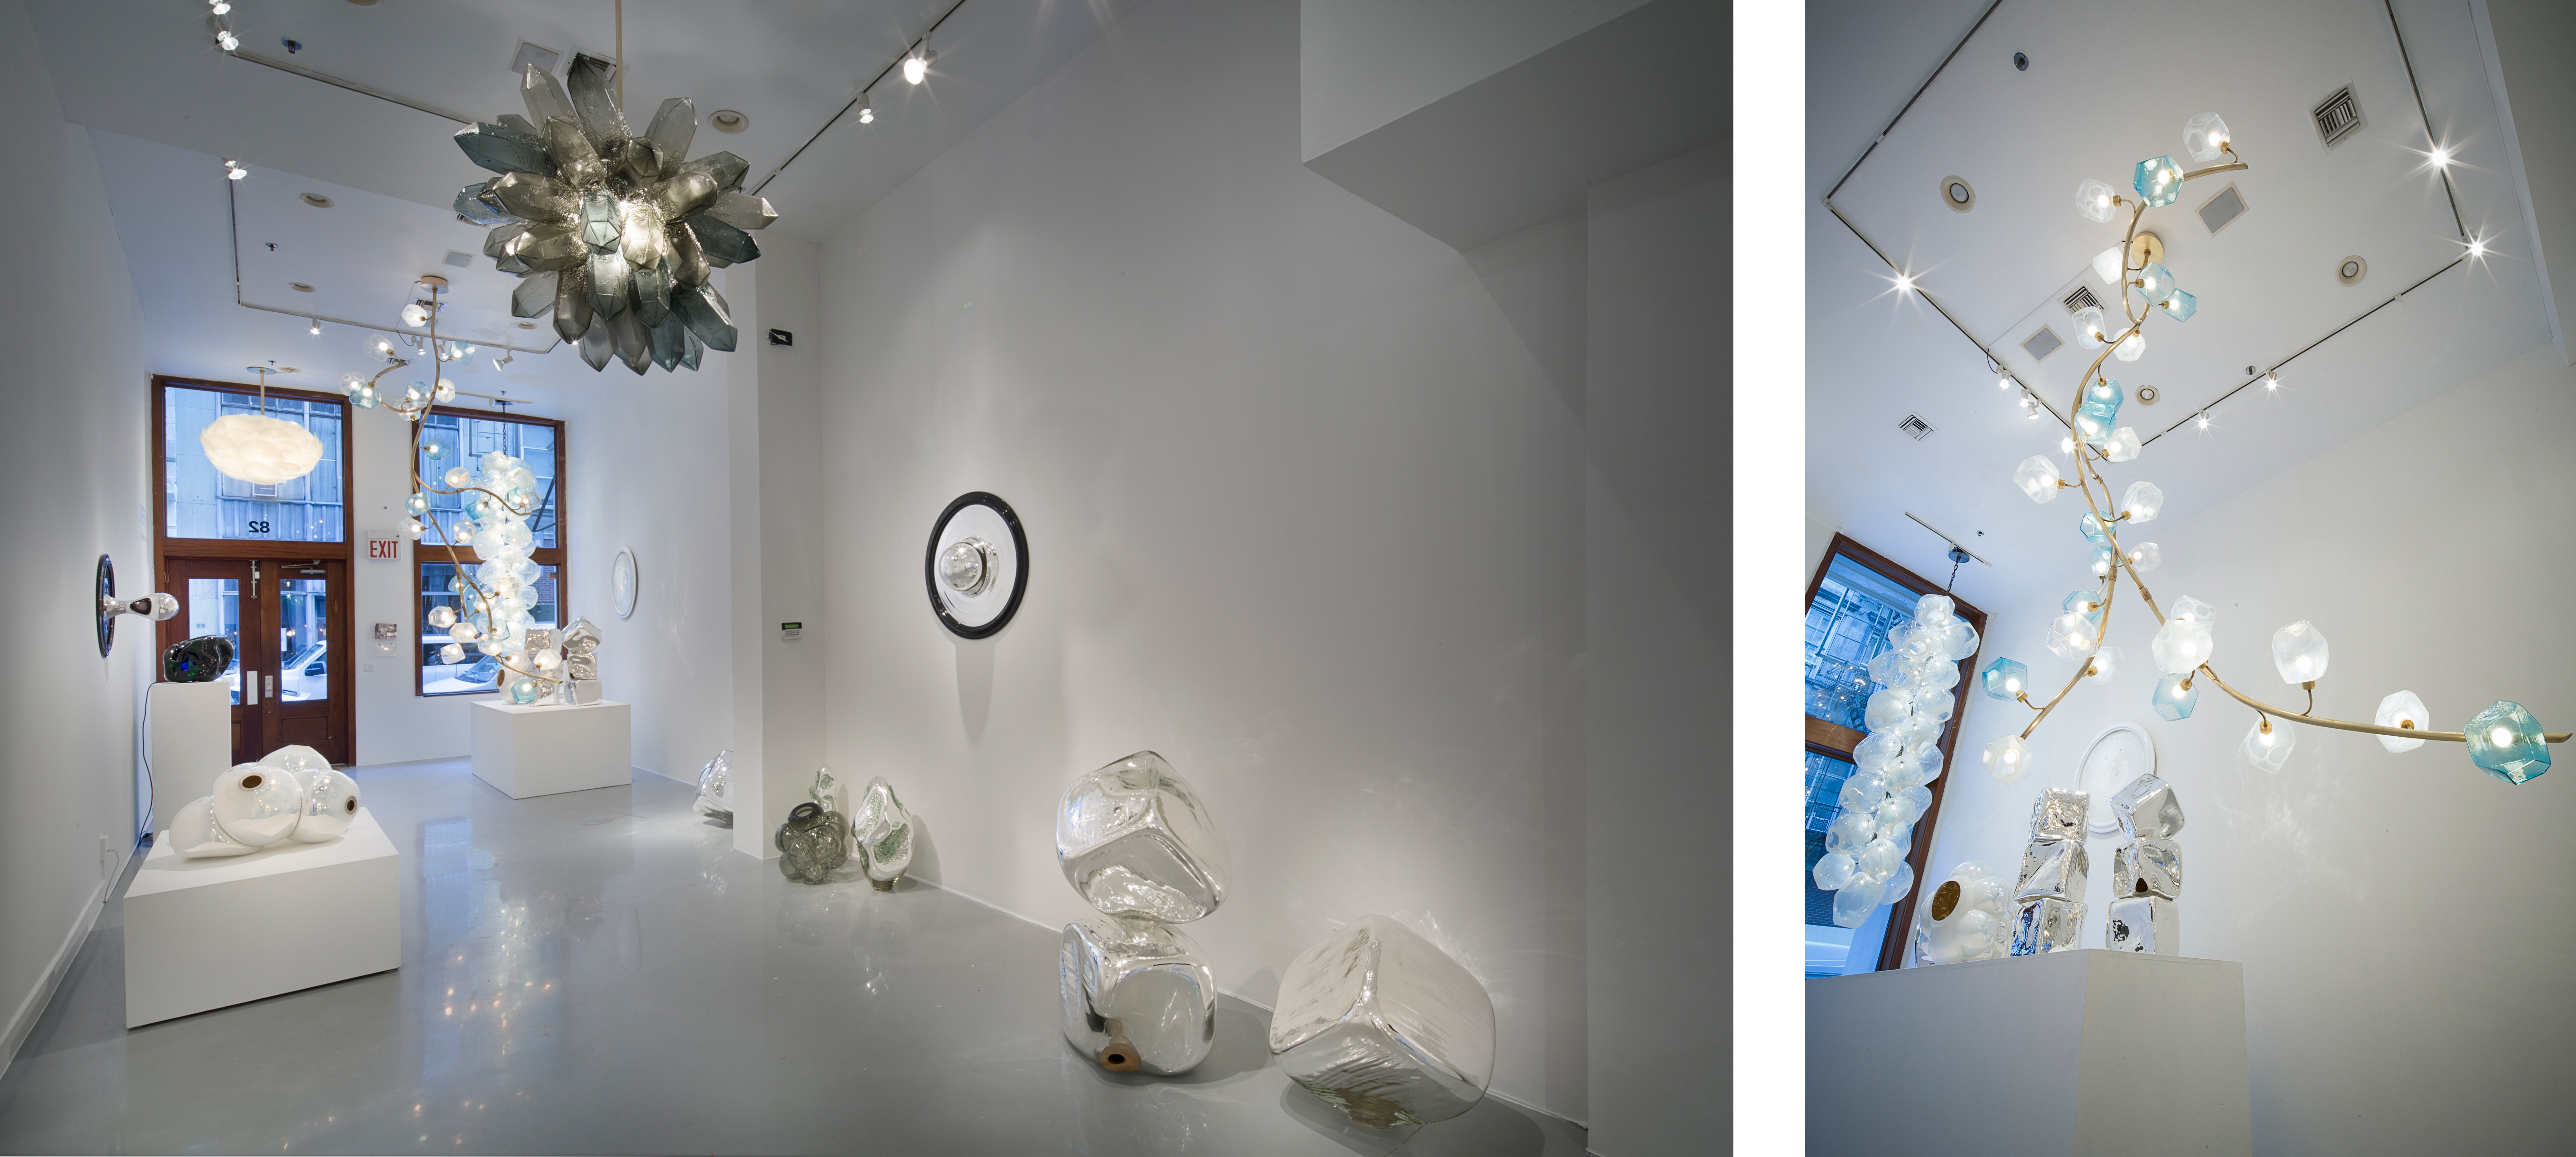 zimmerman lighting. Jeff Zimmerman\u0027s Sculptural Lamps Gleam As Lighting Thrives In Art And Design Spheres - Artsy Zimmerman Z